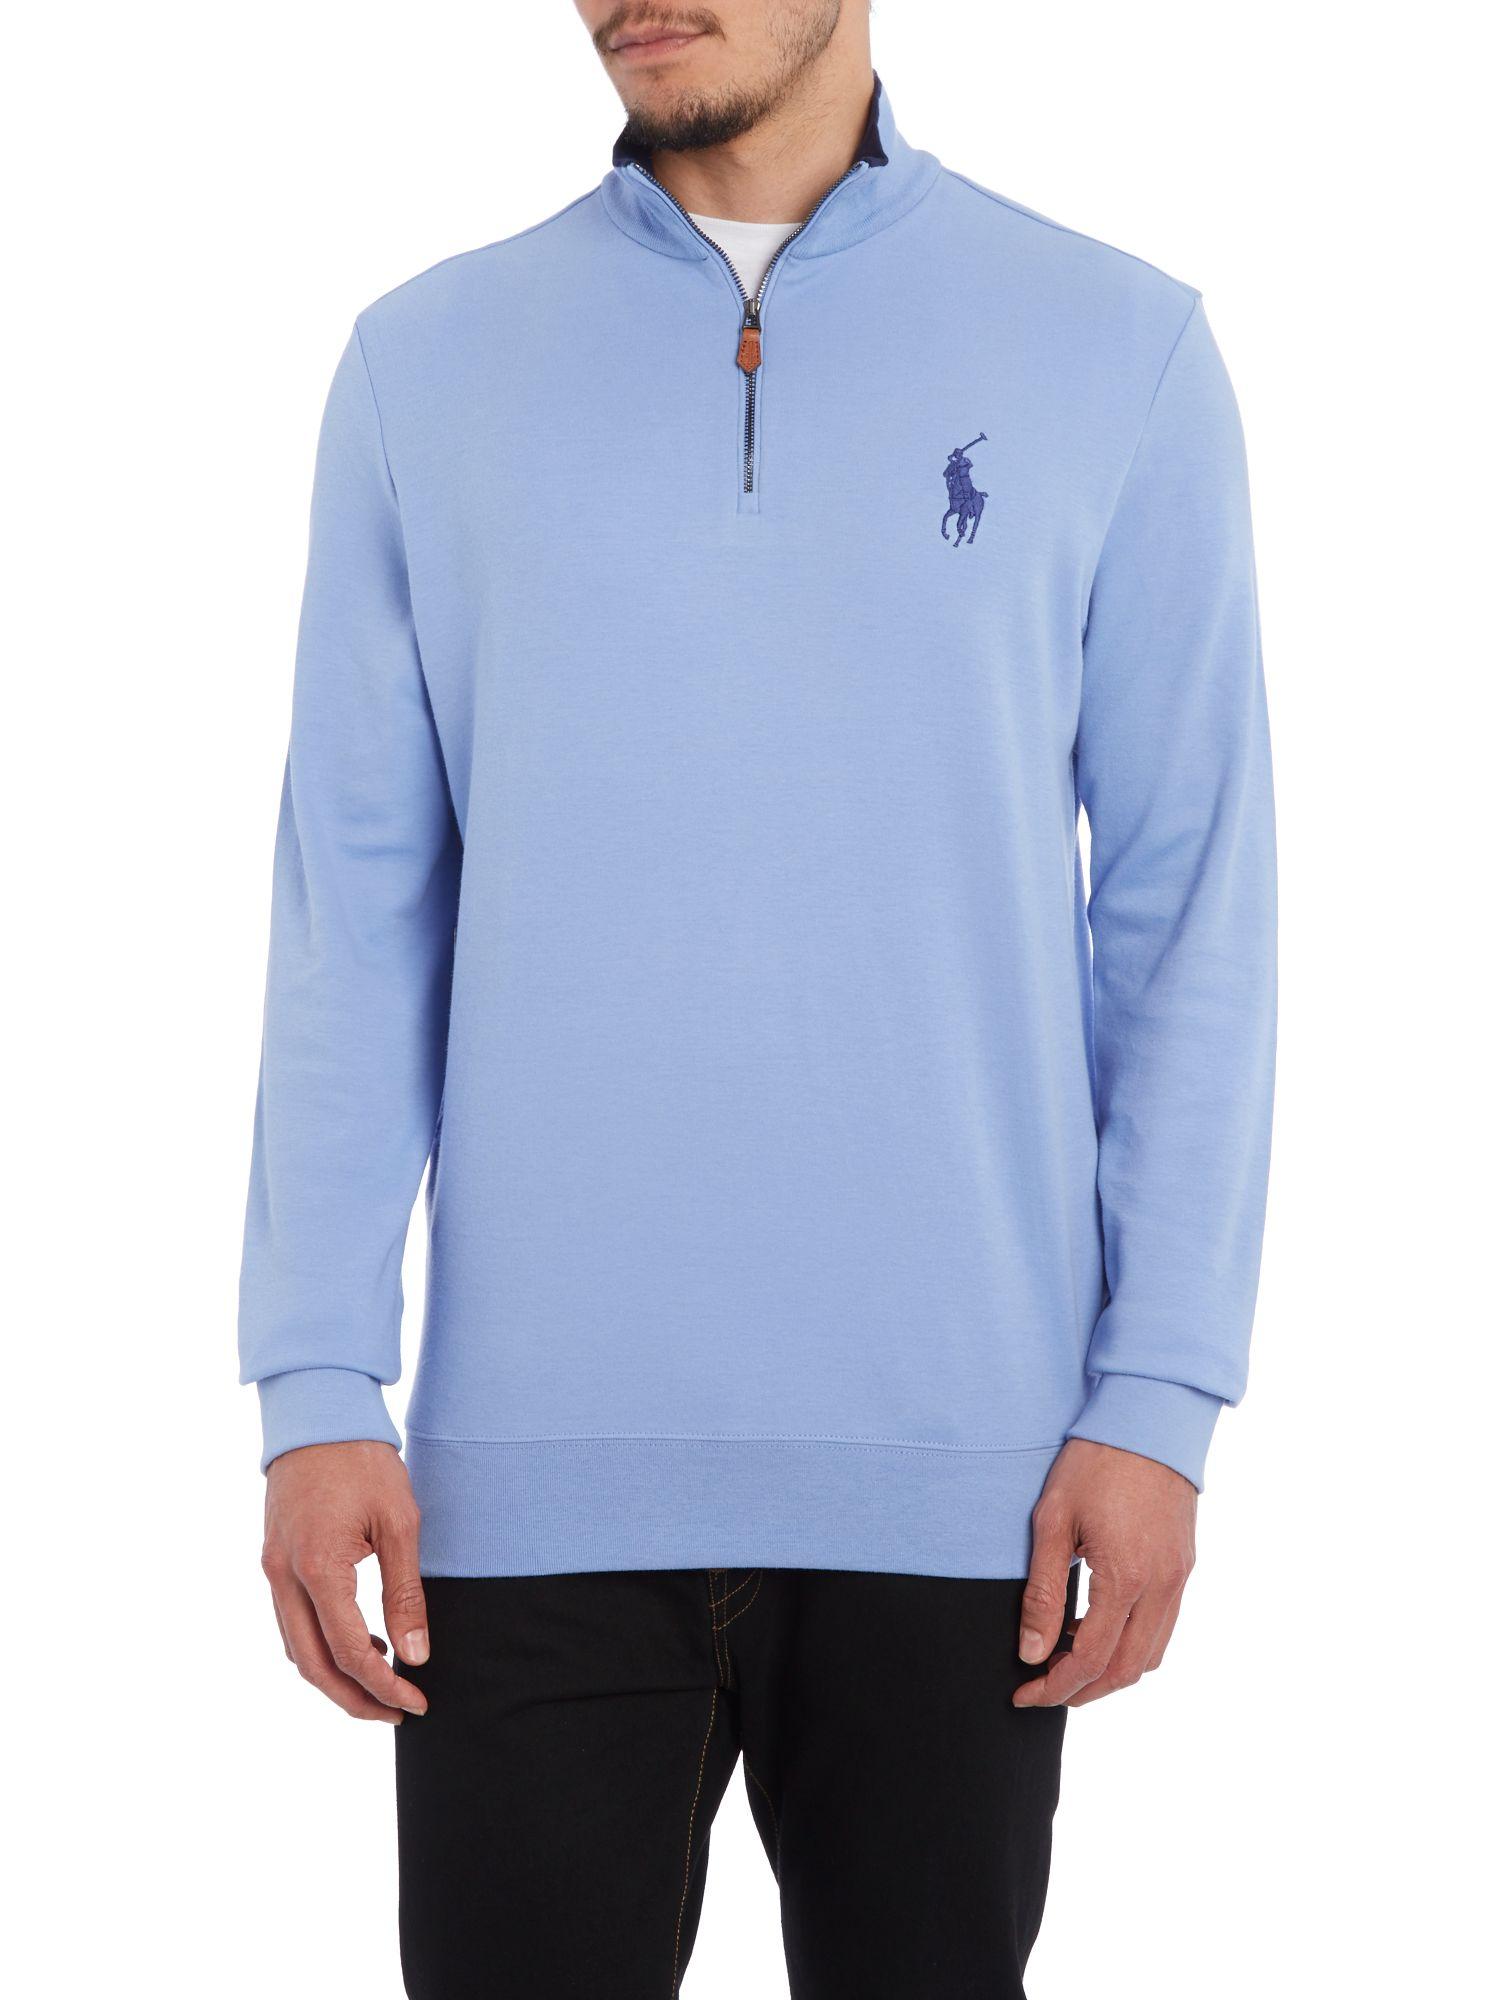 polo ralph lauren mens long sleeve half zip knit sweater discount ...